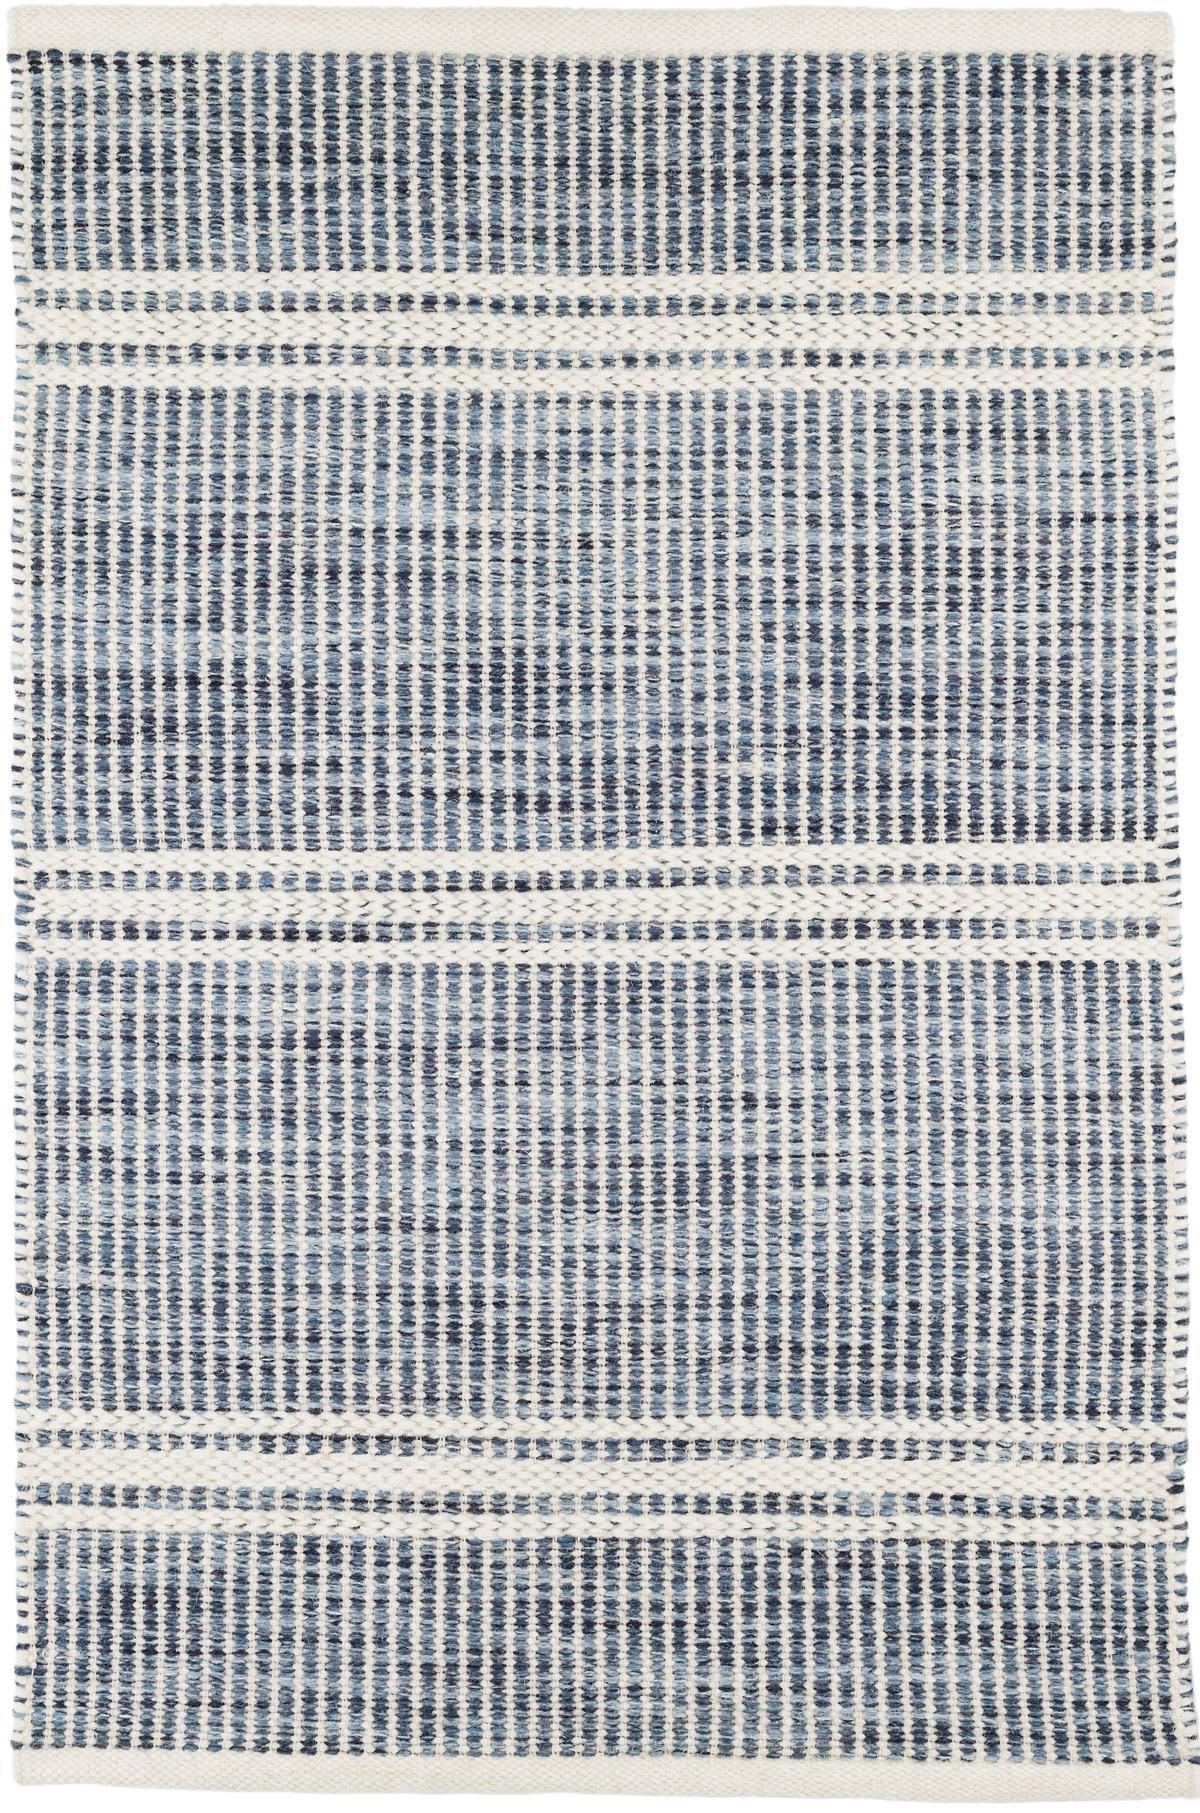 Malta Blue Woven Wool Rug | Dash & Albert